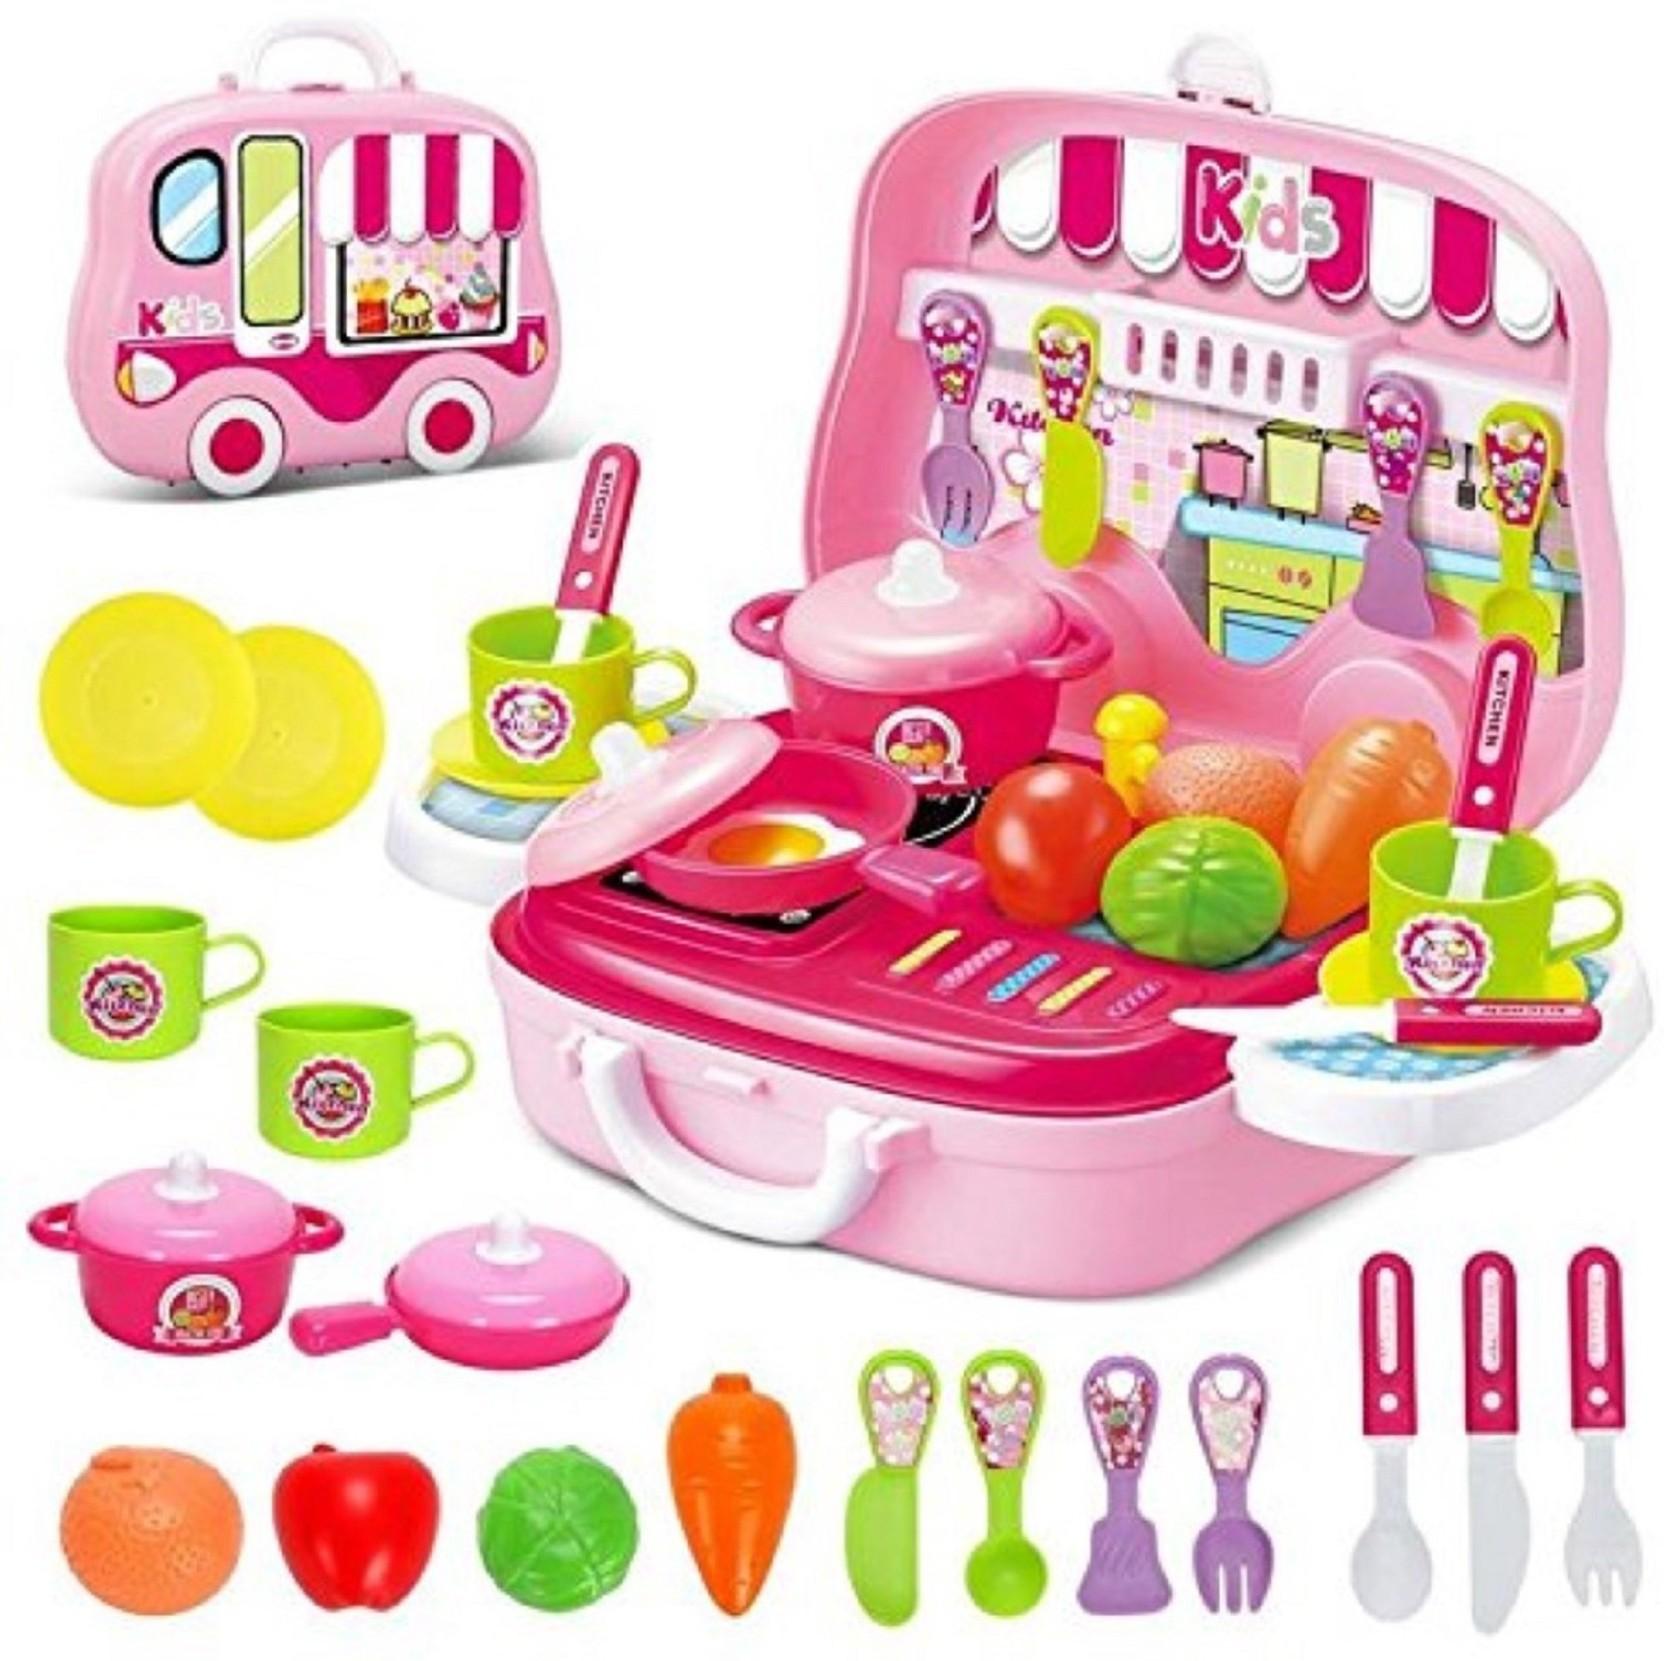 ec4616611fc Zest 4 Toyz Role Play Kitchen Playset Toy Kids Pretend Cooking Kit ...